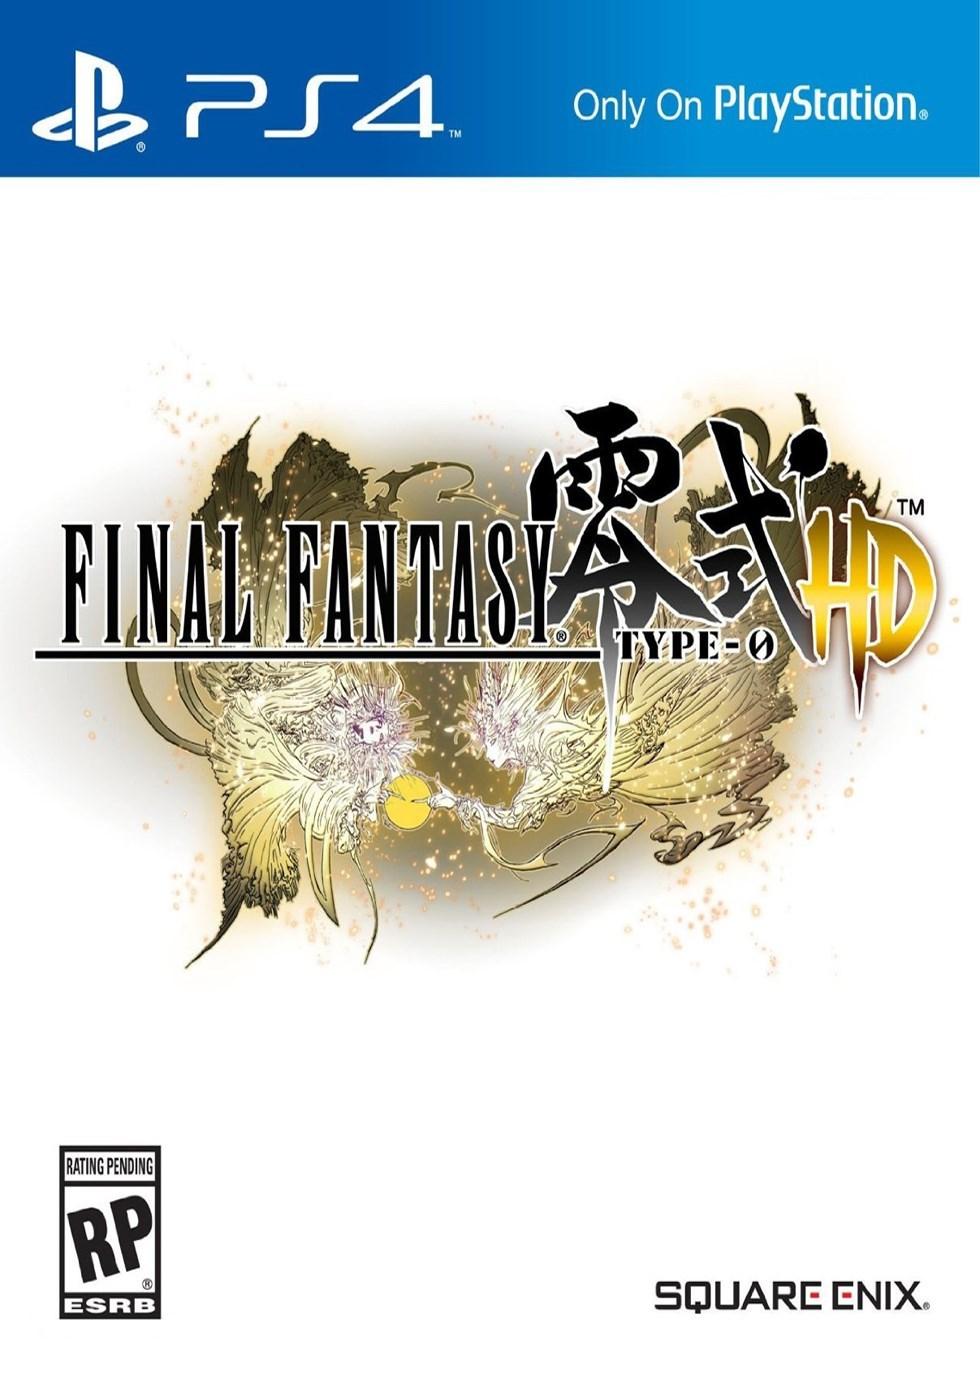 最终幻想零式HD(Fantasy Type-0 HD)》IGN评分8.0 优秀的复刻